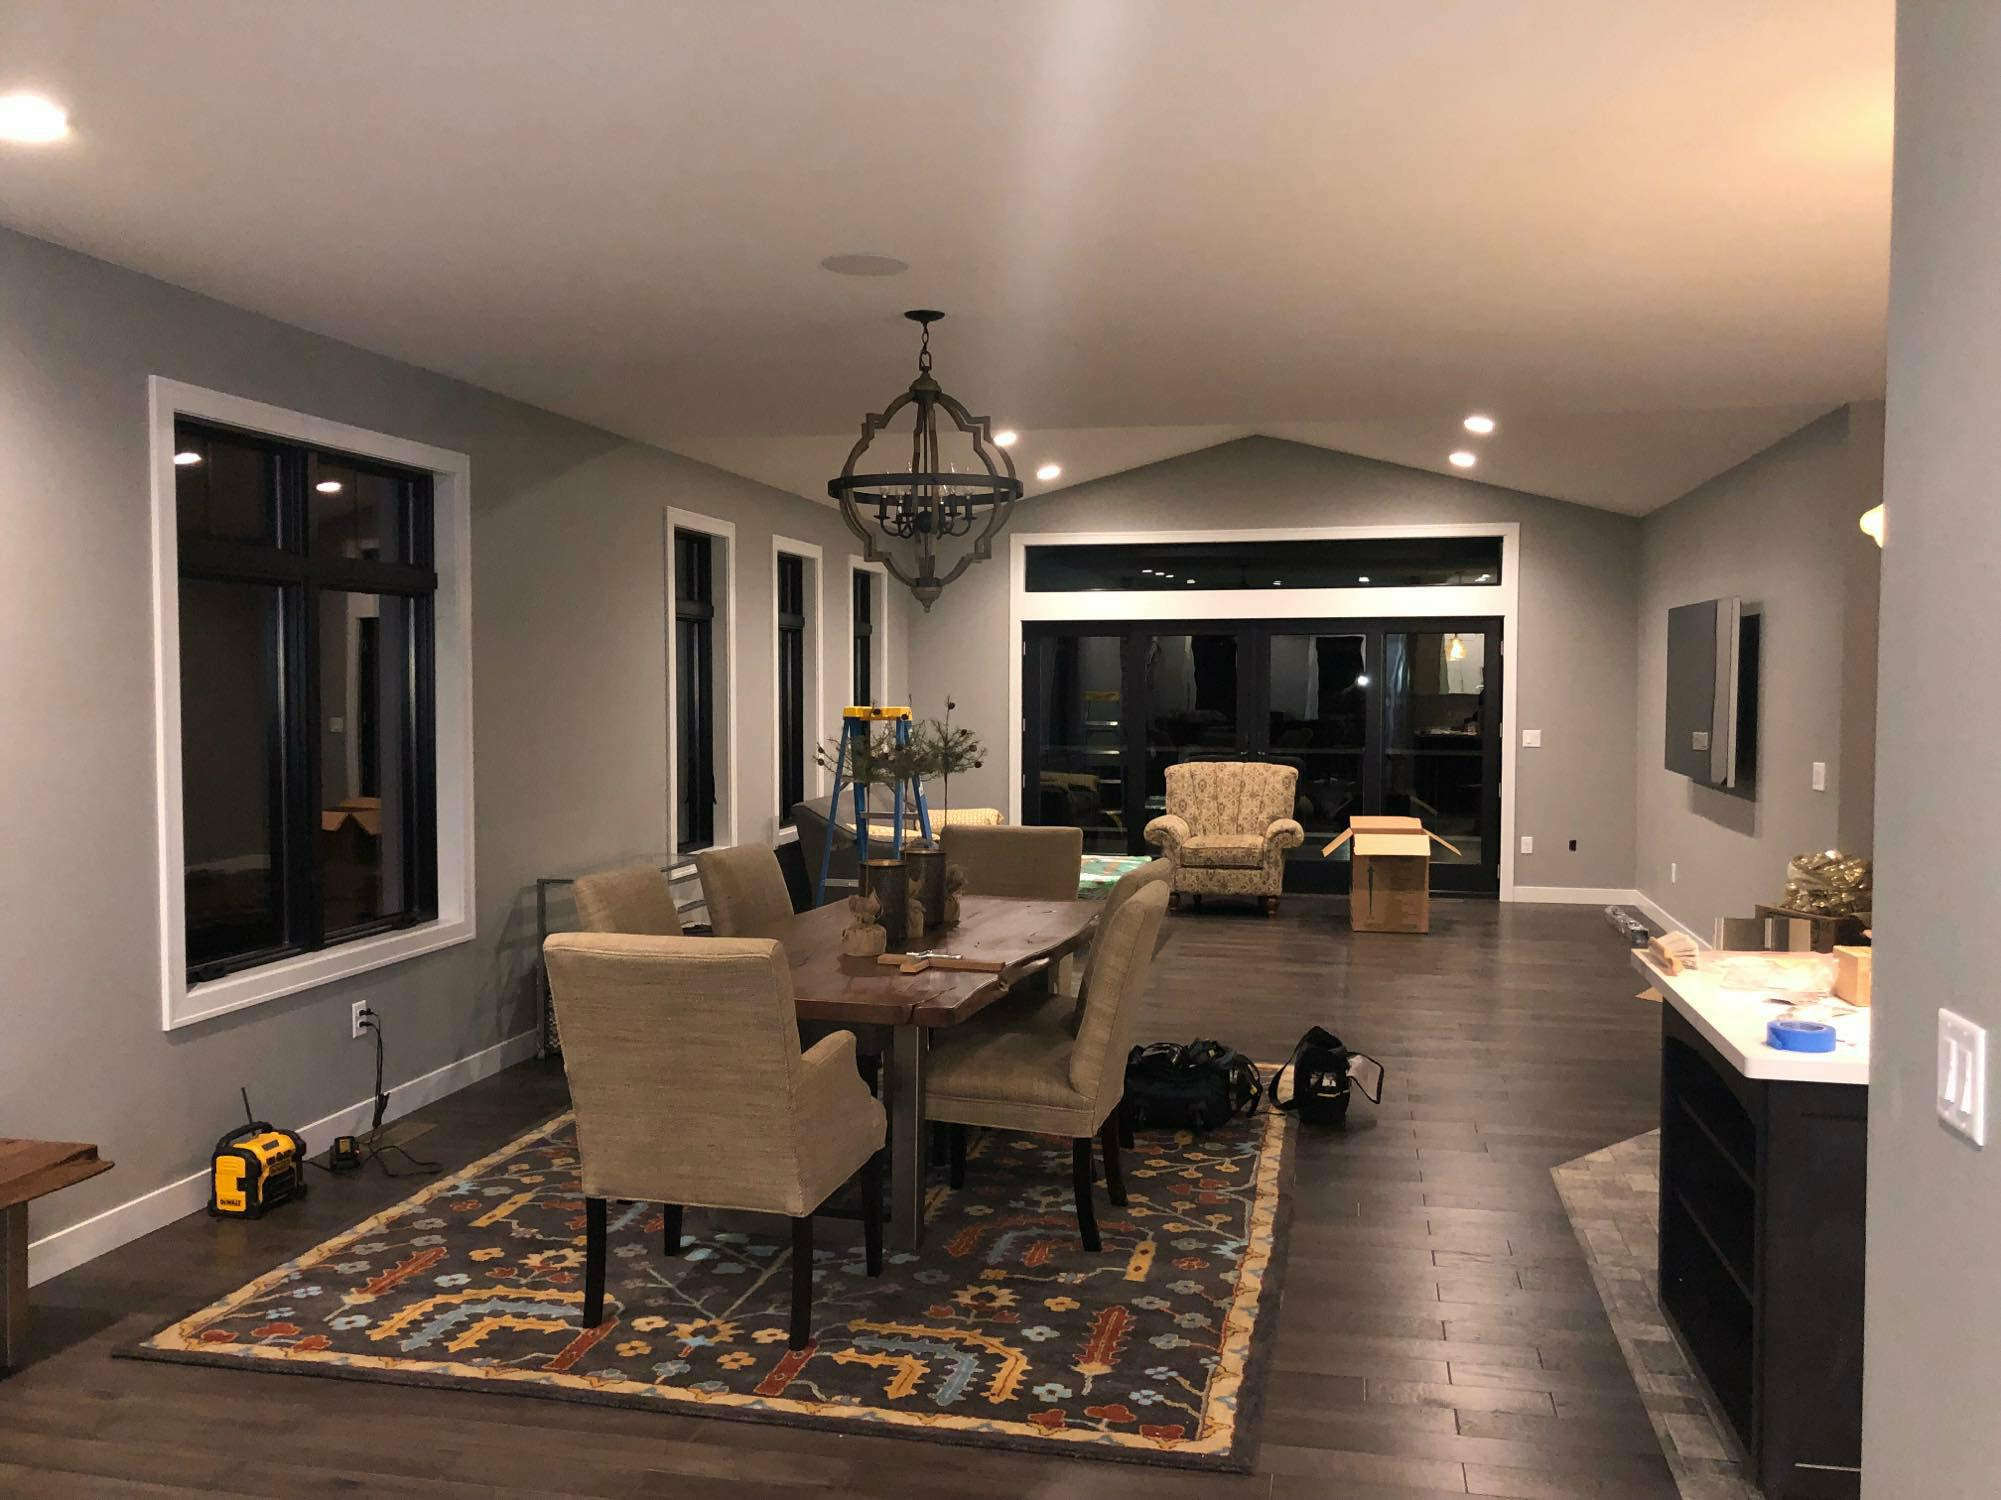 Hugo Home Improvement 607 N 1st St Strasburg ND 58573